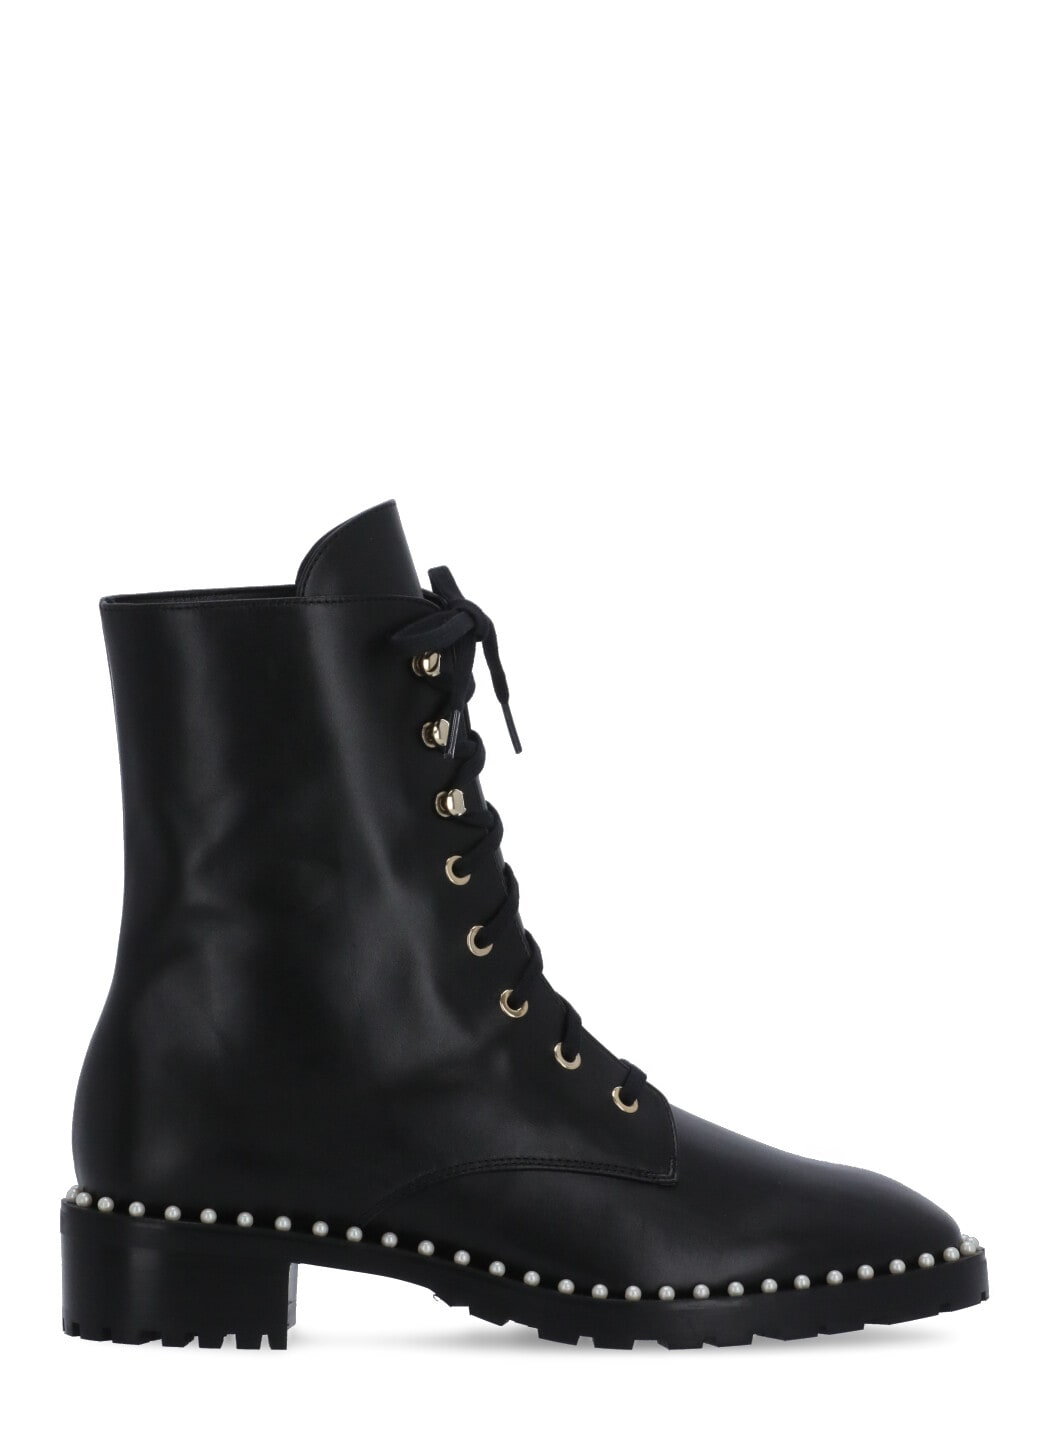 Buy Stuart Weitzman Allie Boot online, shop Stuart Weitzman shoes with free shipping